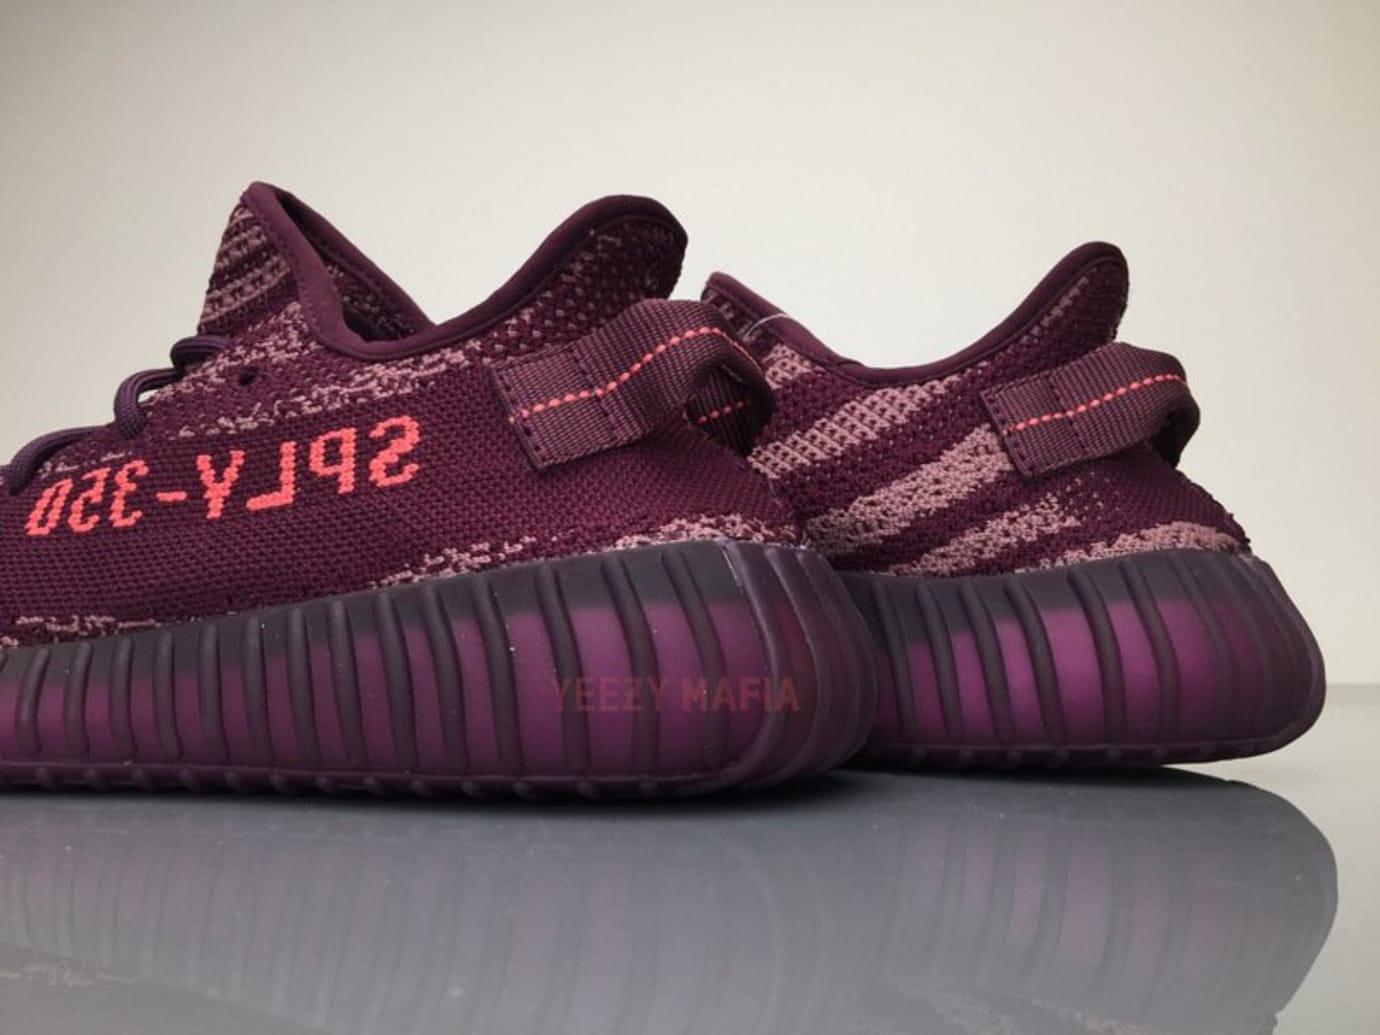 e9f55de73d7 Image via Yeezy Mafia on Twitter · Adidas Yeezy Boost 350 V2 Red Night  Chalk Heel